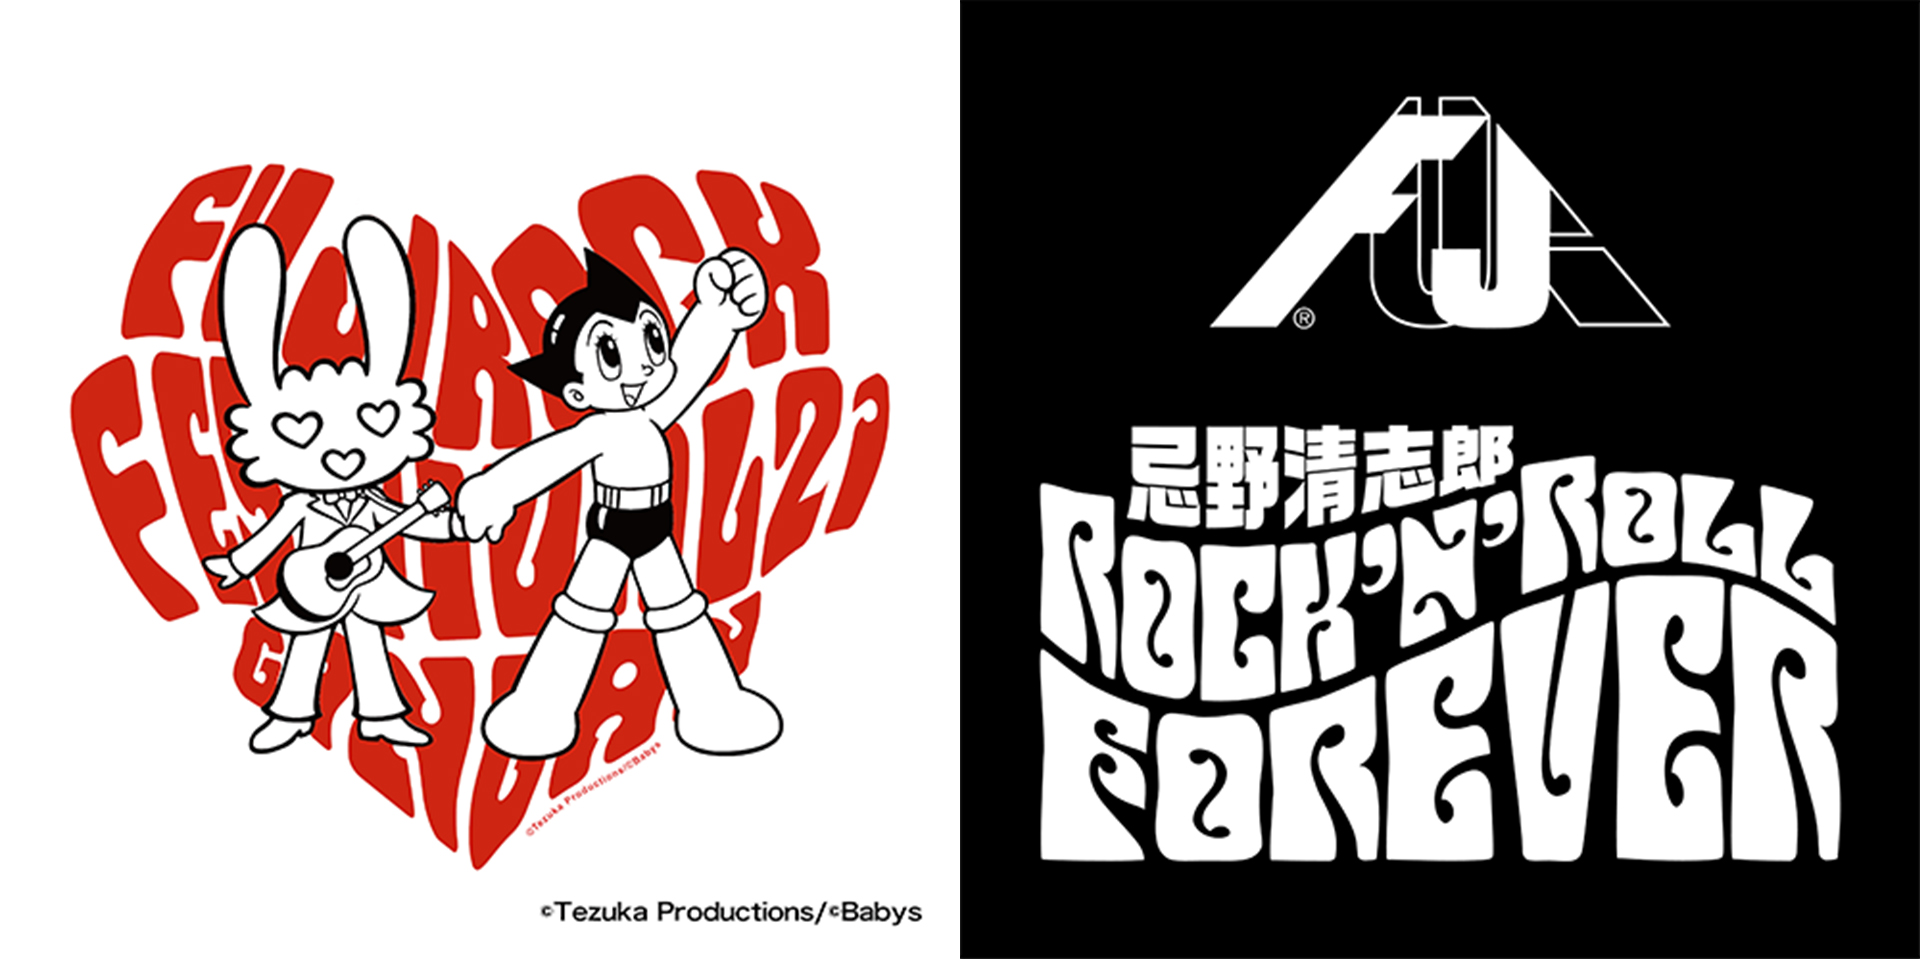 0610_taf_junji-ikehata_12 池畑潤二がセッションステージで繋ぐフジロックと音楽のストーリー#fujirock